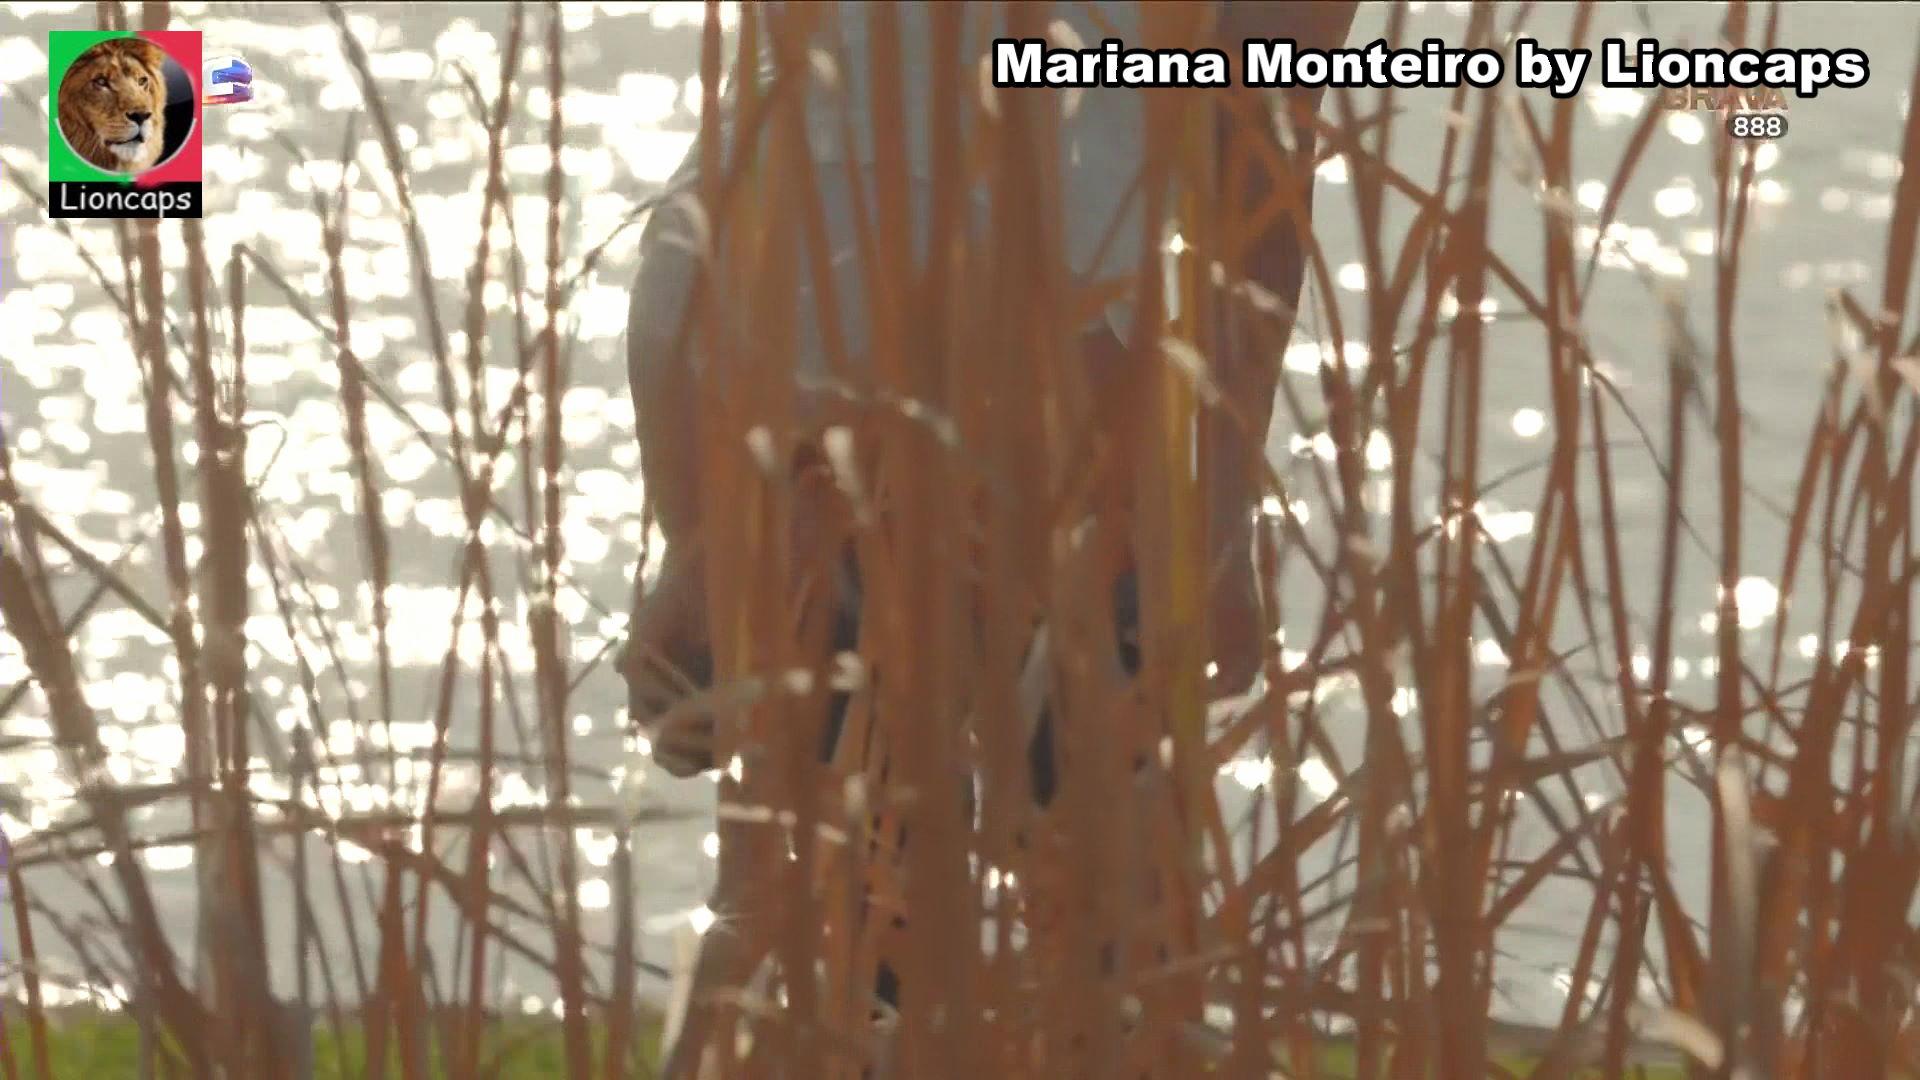 519645843_mariana_monteiro_vs191201_0324_122_416lo.JPG